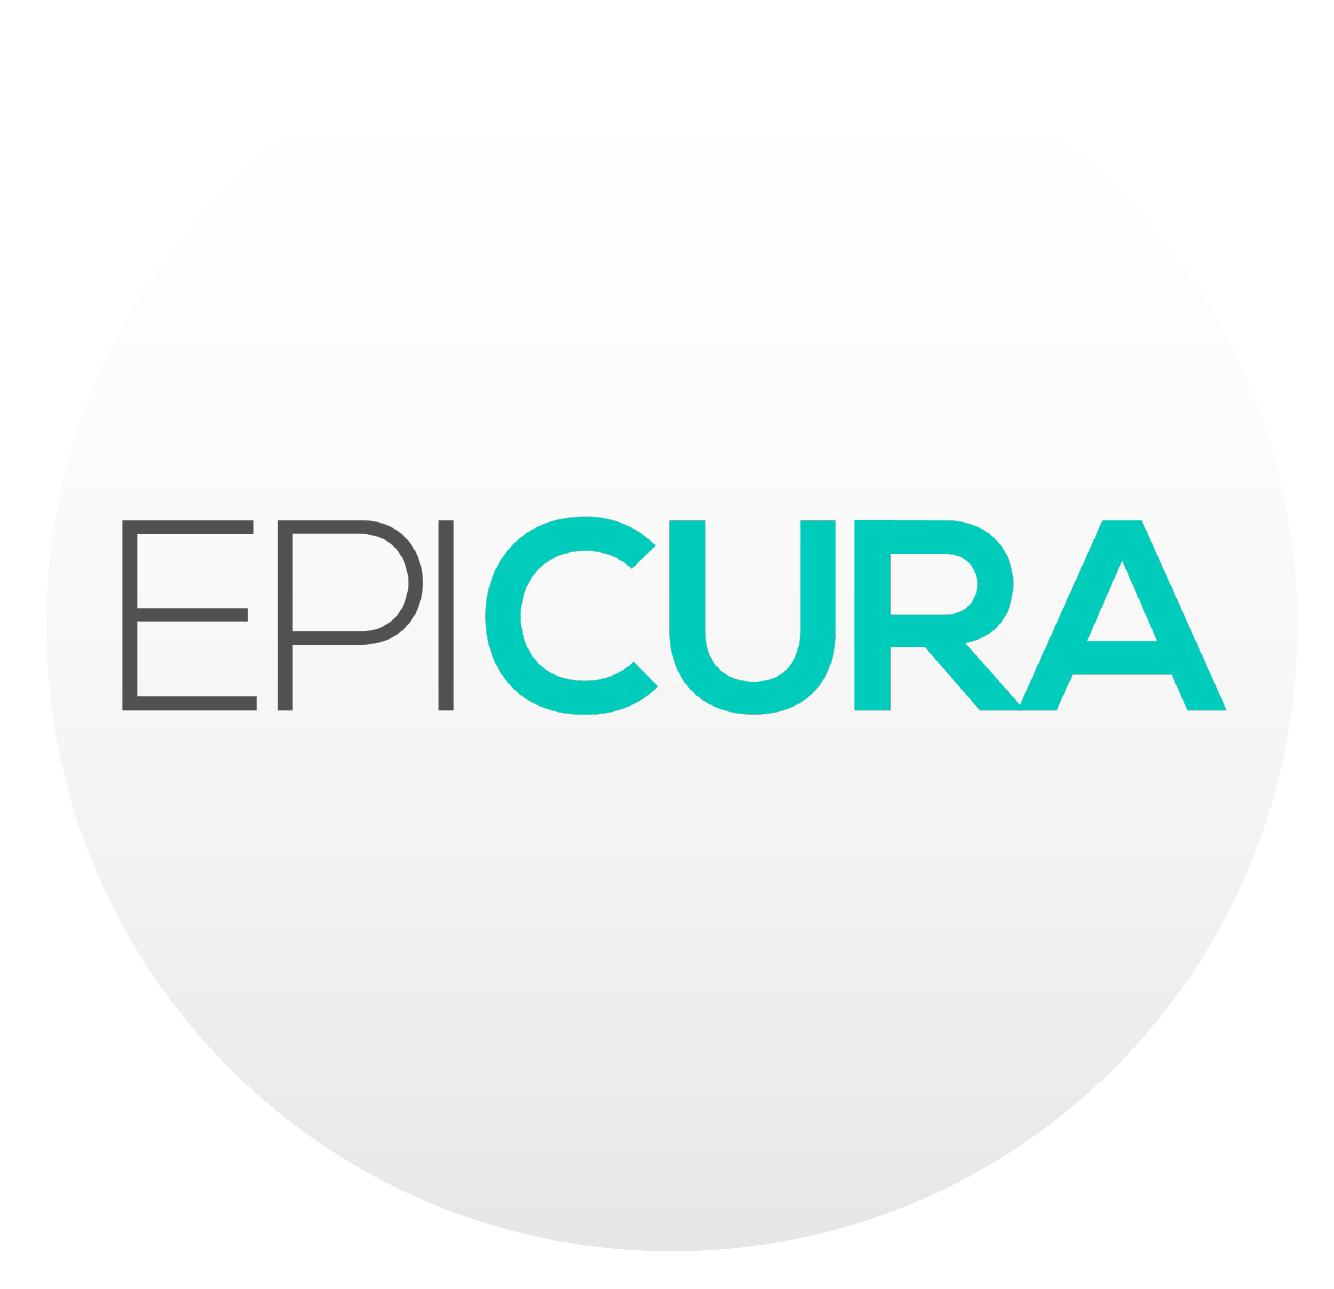 EpiCura | Mamacrowd